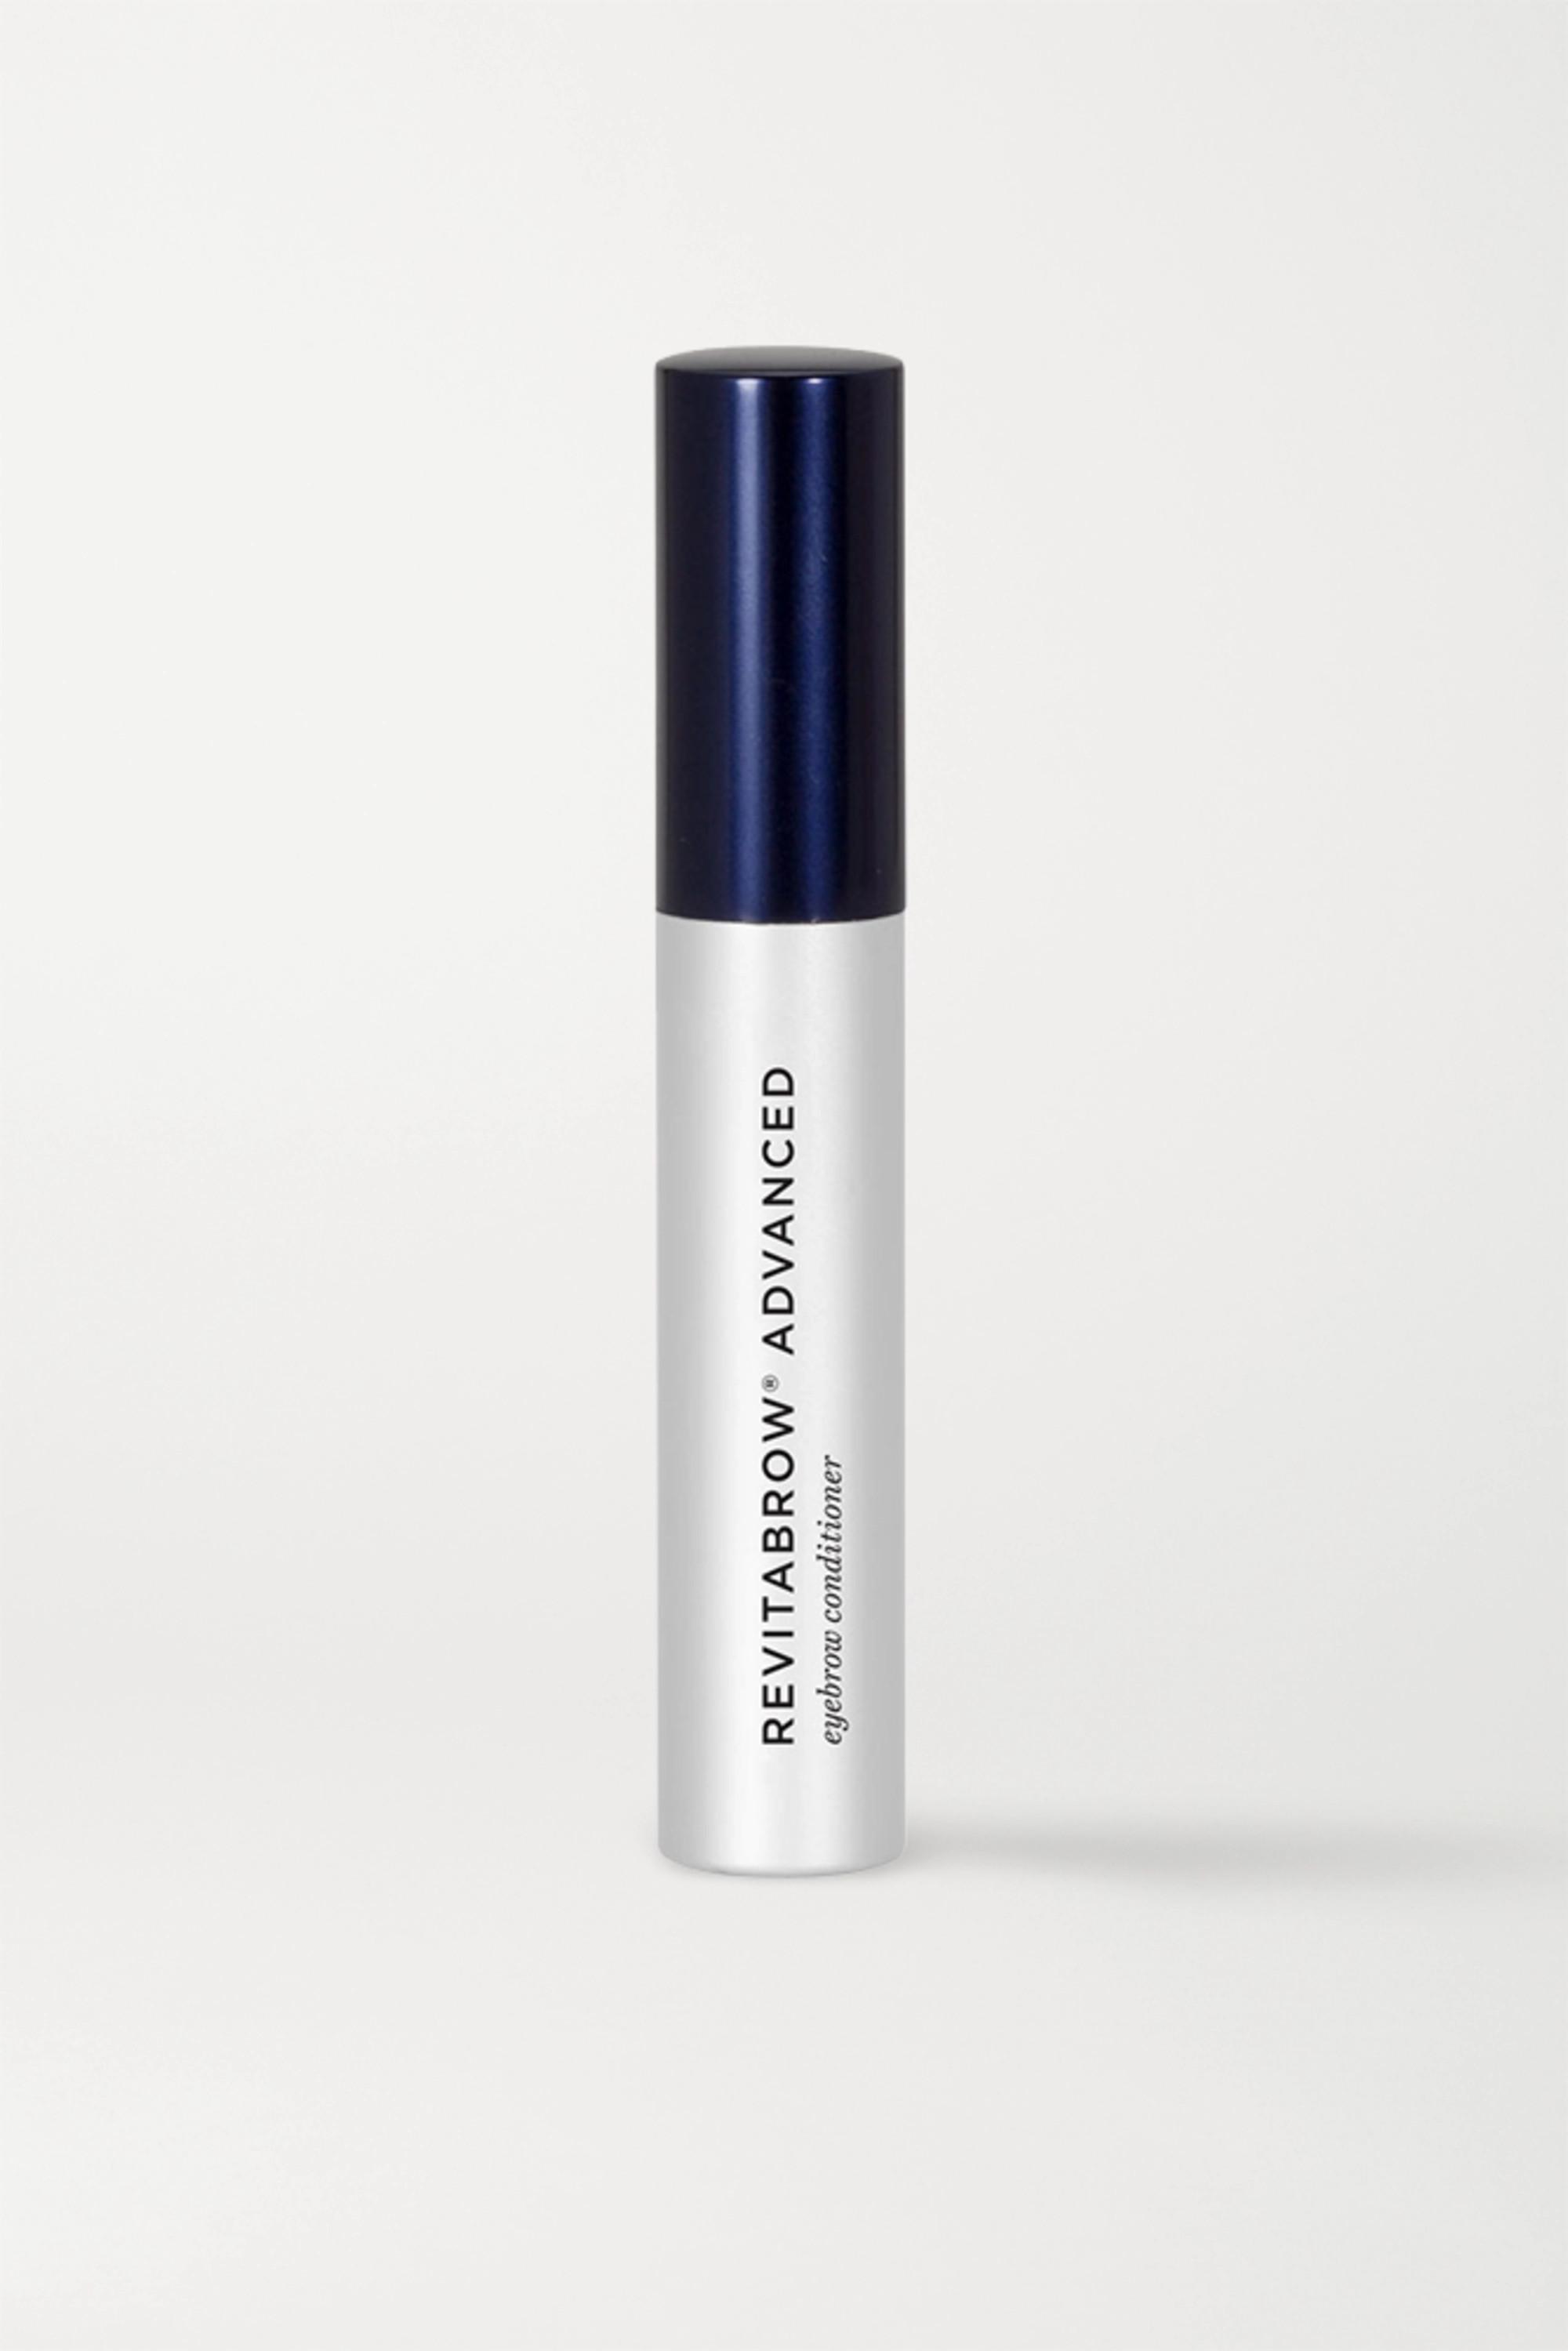 Colorless Revitabrow Advanced Eyebrow Conditioner, 1.5ml ...